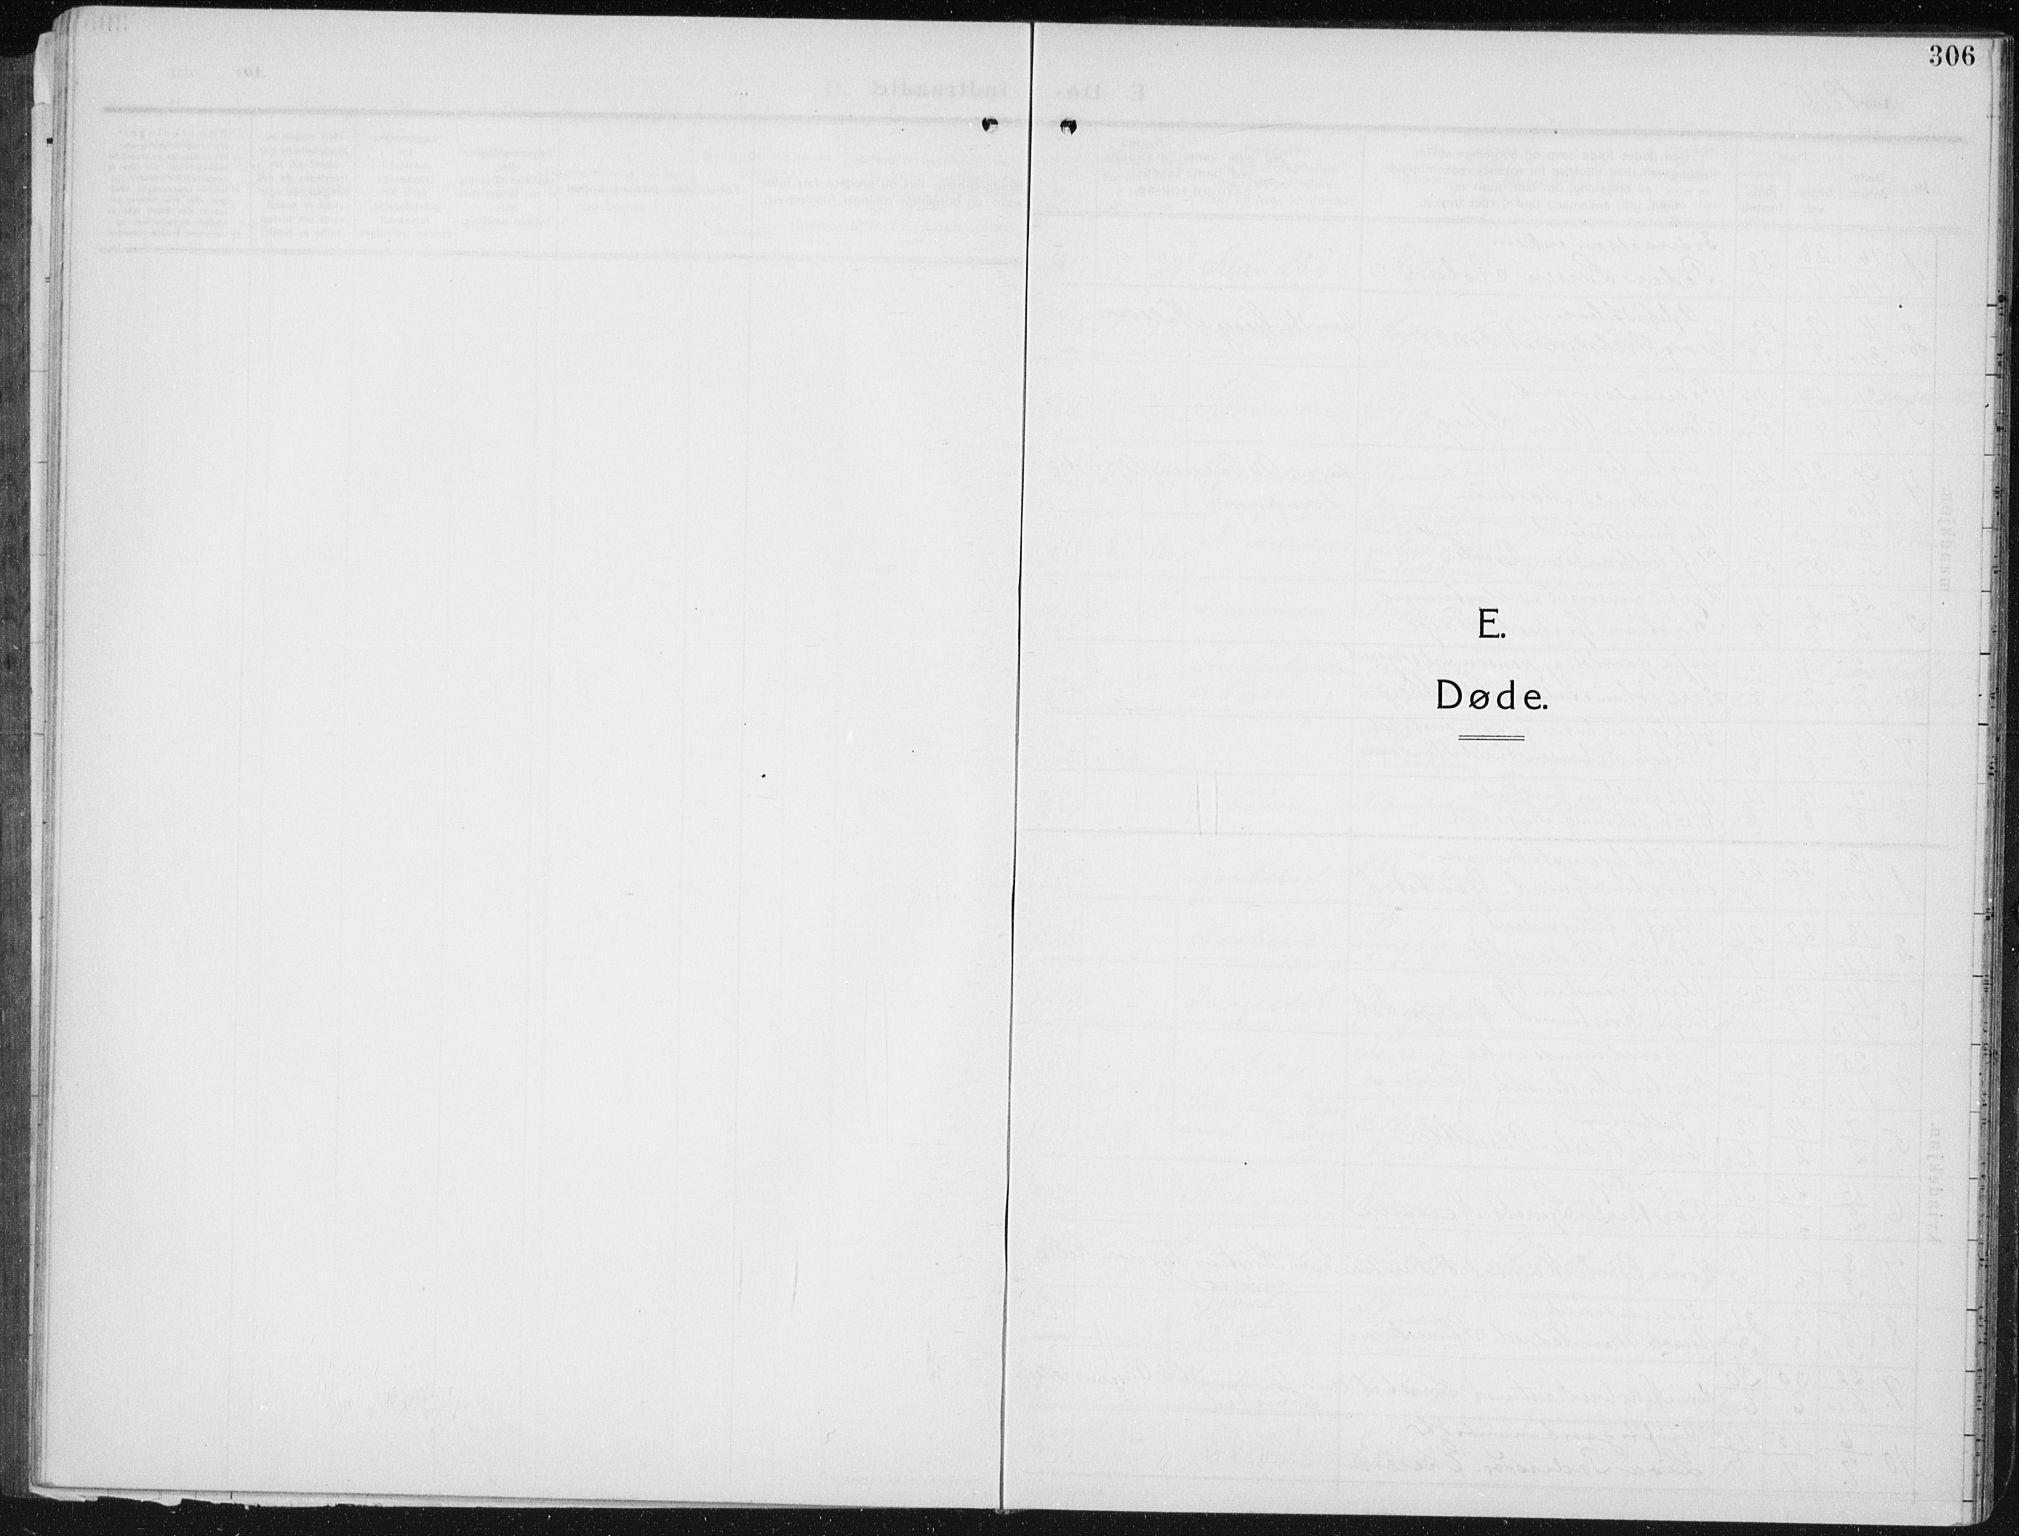 SAH, Biri prestekontor, Klokkerbok nr. 6, 1909-1938, s. 306